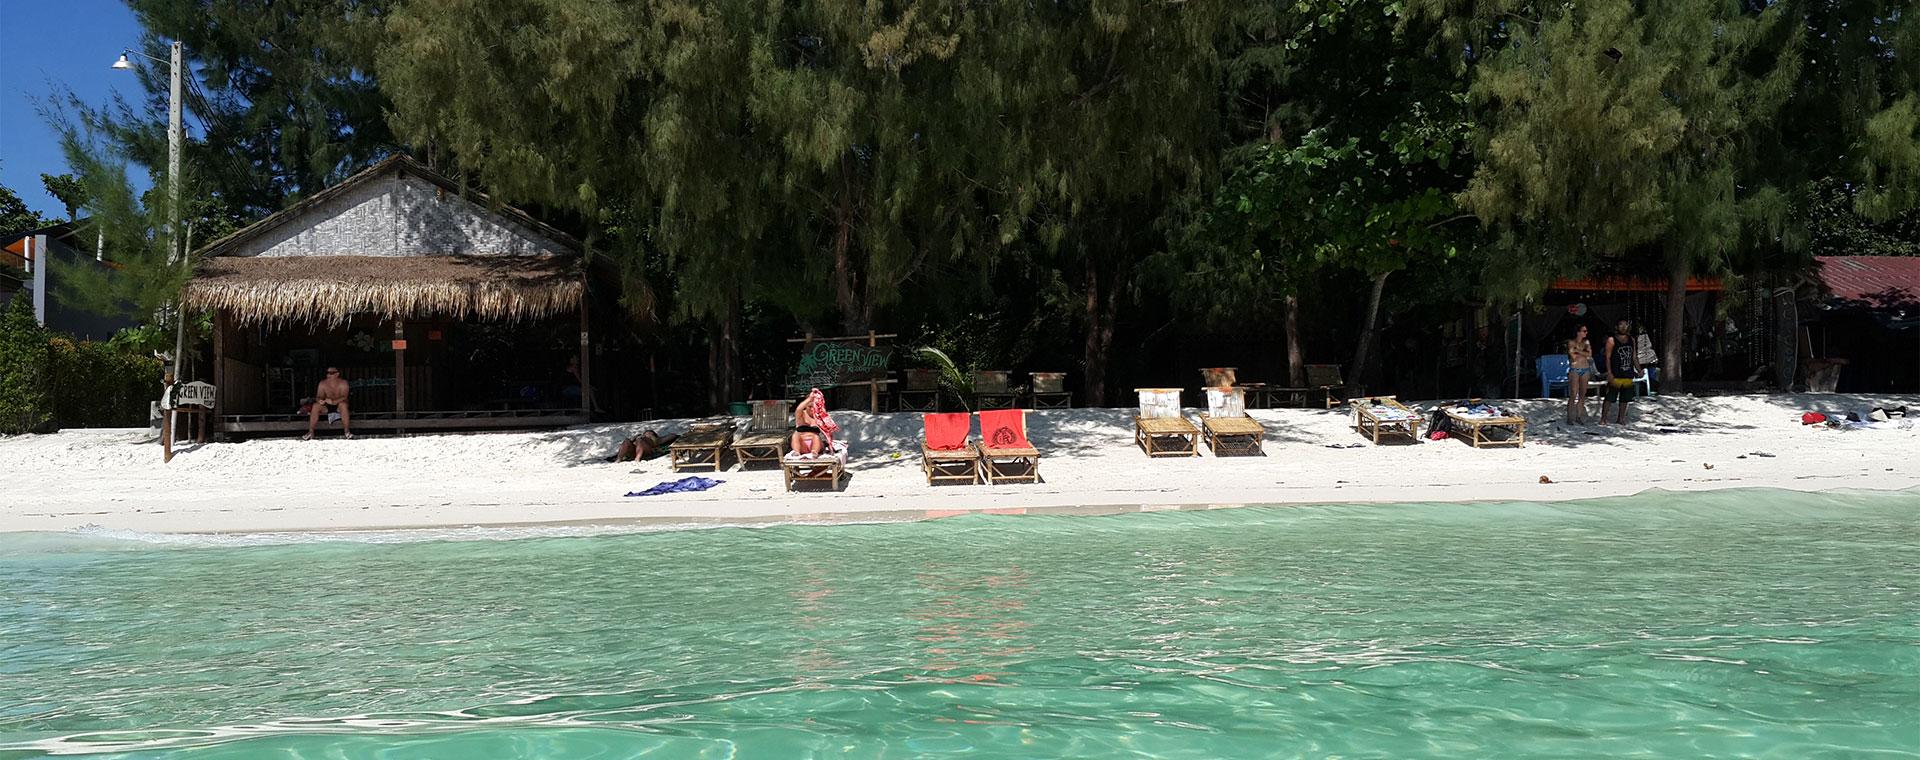 Bamboo garden rooms at lipe beach resort koh lipe - Bamboo Garden Rooms At Lipe Beach Resort Koh Lipe 26